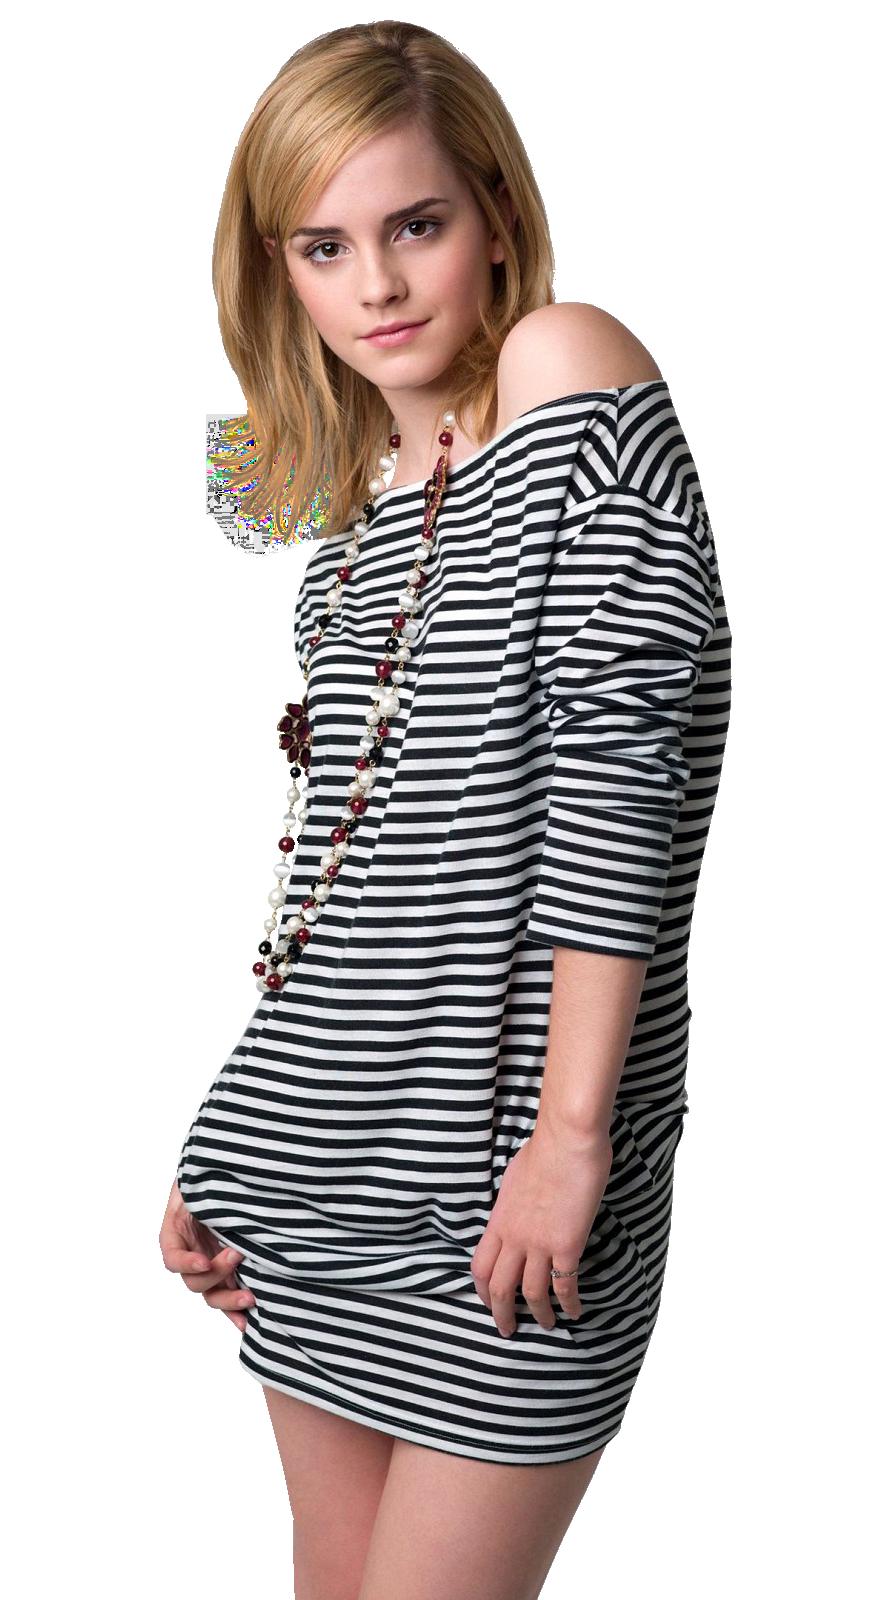 Emma Watson PNG-PlusPNG.com-875 - Emma Watson PNG